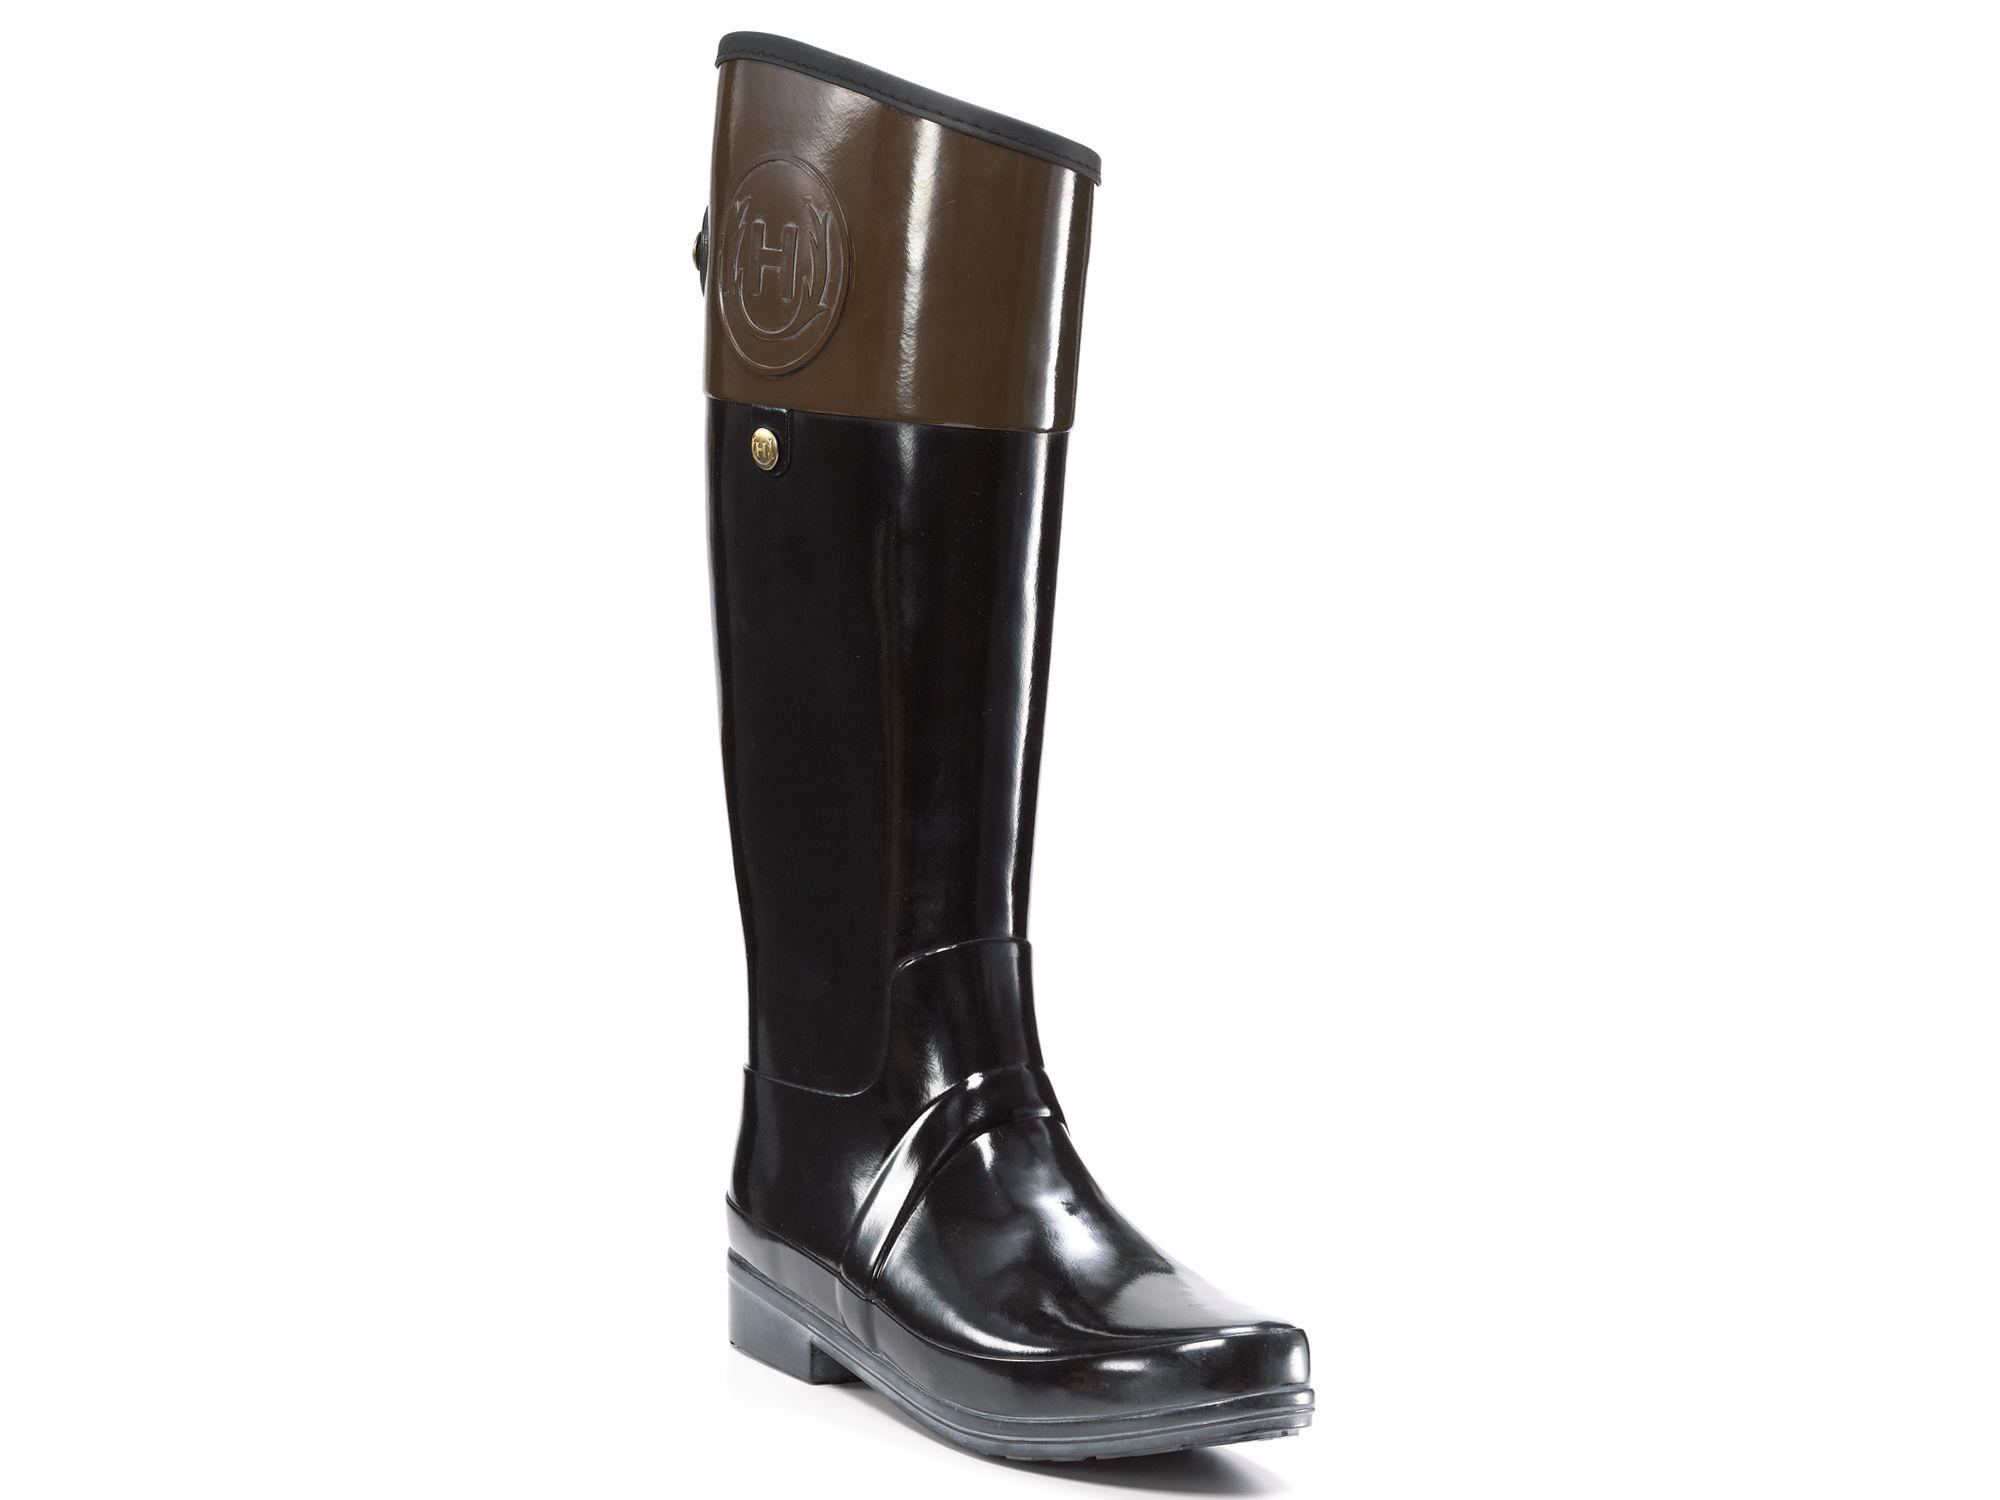 regent carlyle boots in black milk chocolate